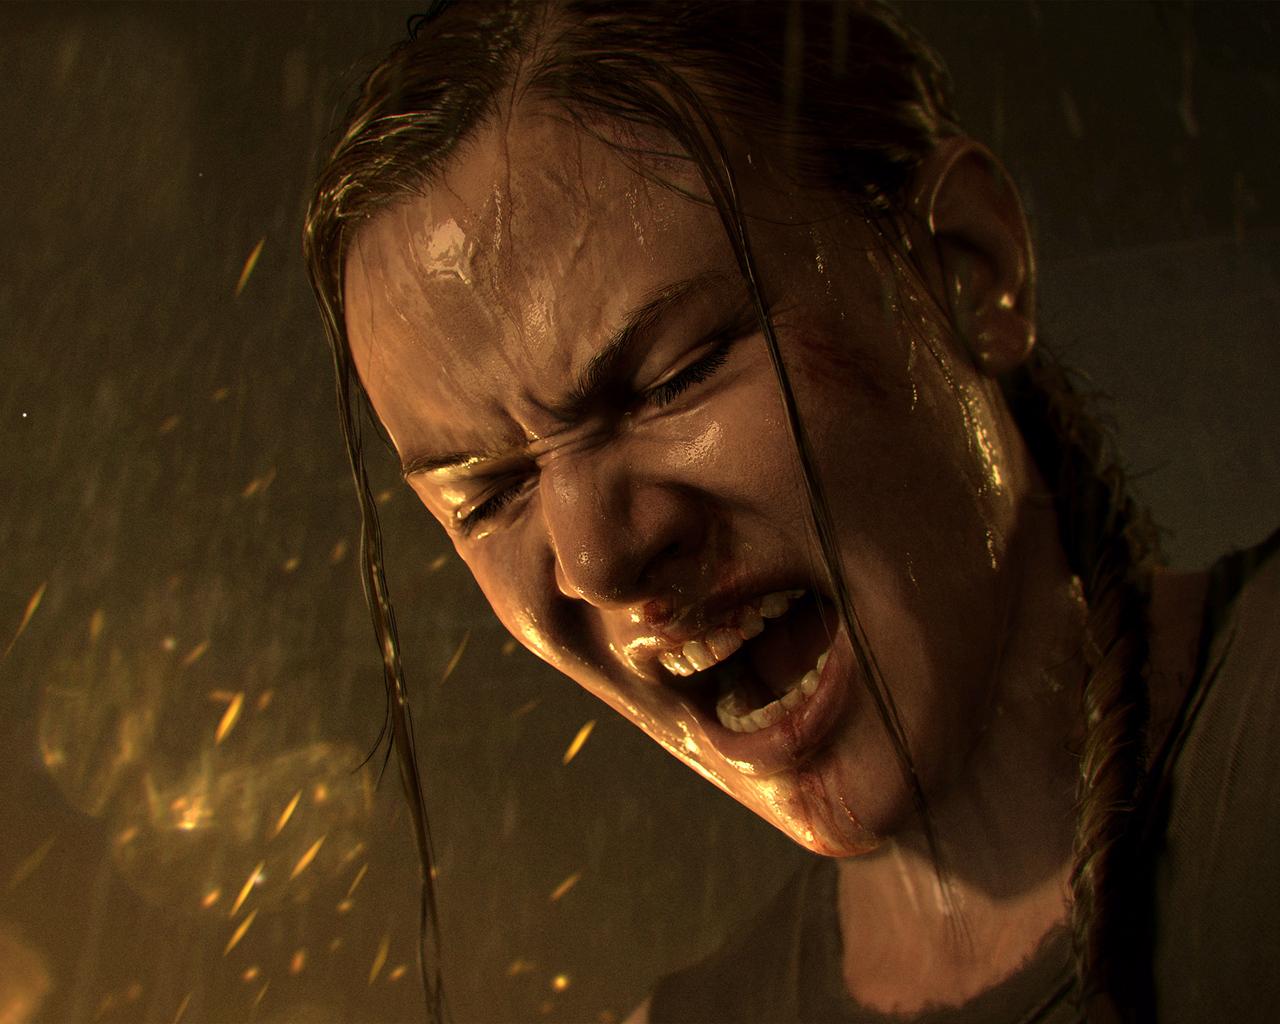 1280x1024 The Last Of Us Part 2 1280x1024 Resolution Hd 4k